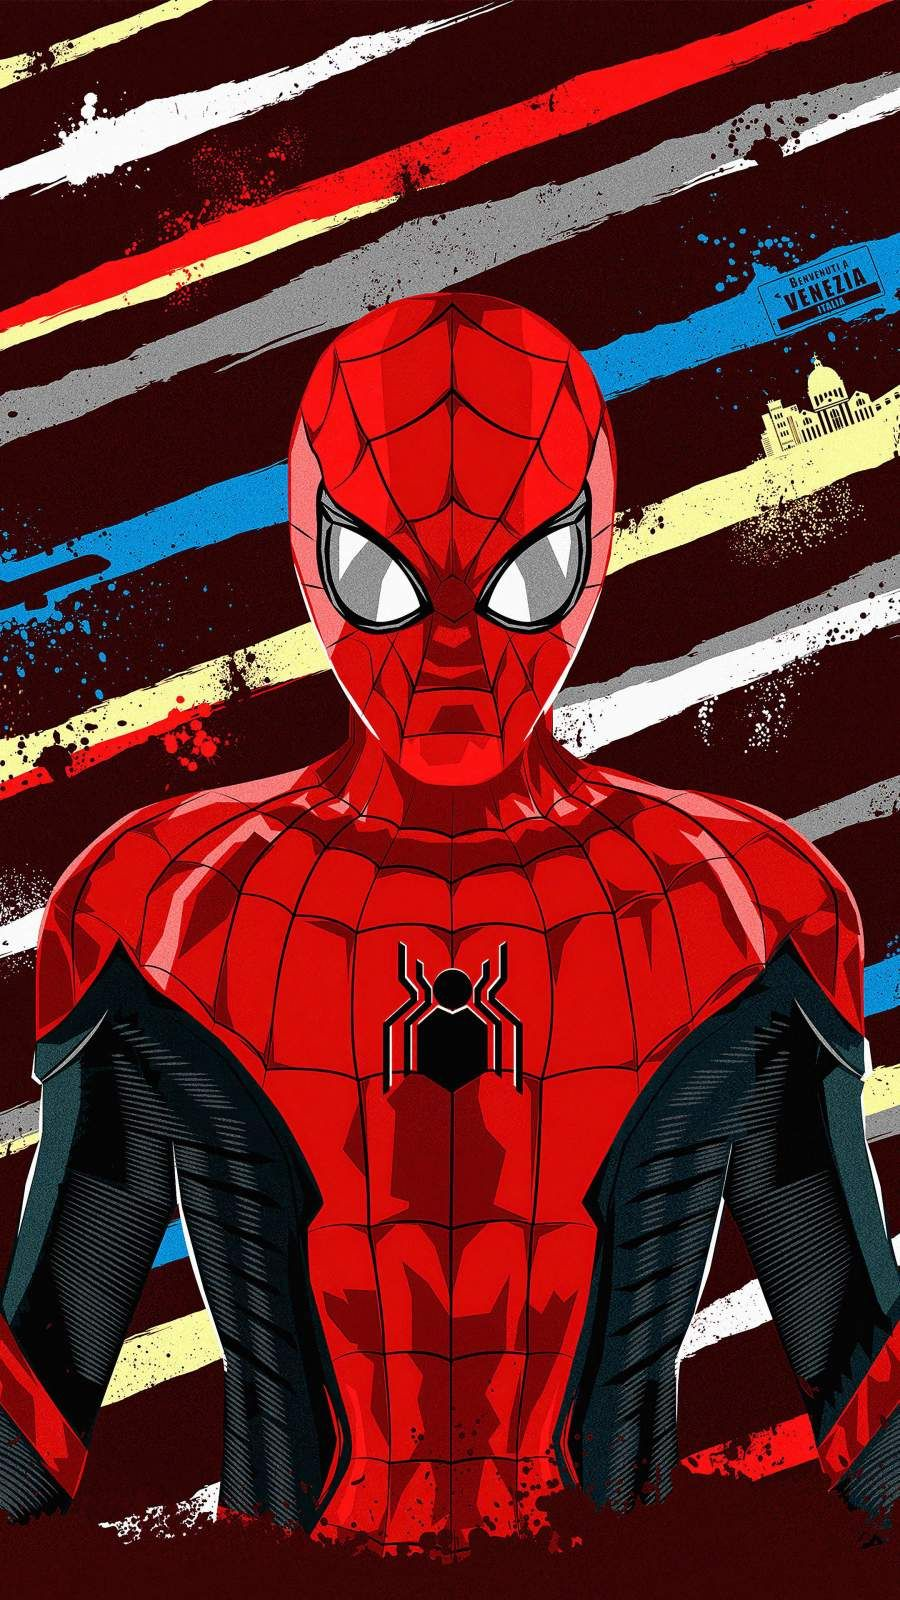 Spiderman Artwork Iphone Wallpaper Spiderman Artwork Spiderman Marvel Comics Wallpaper